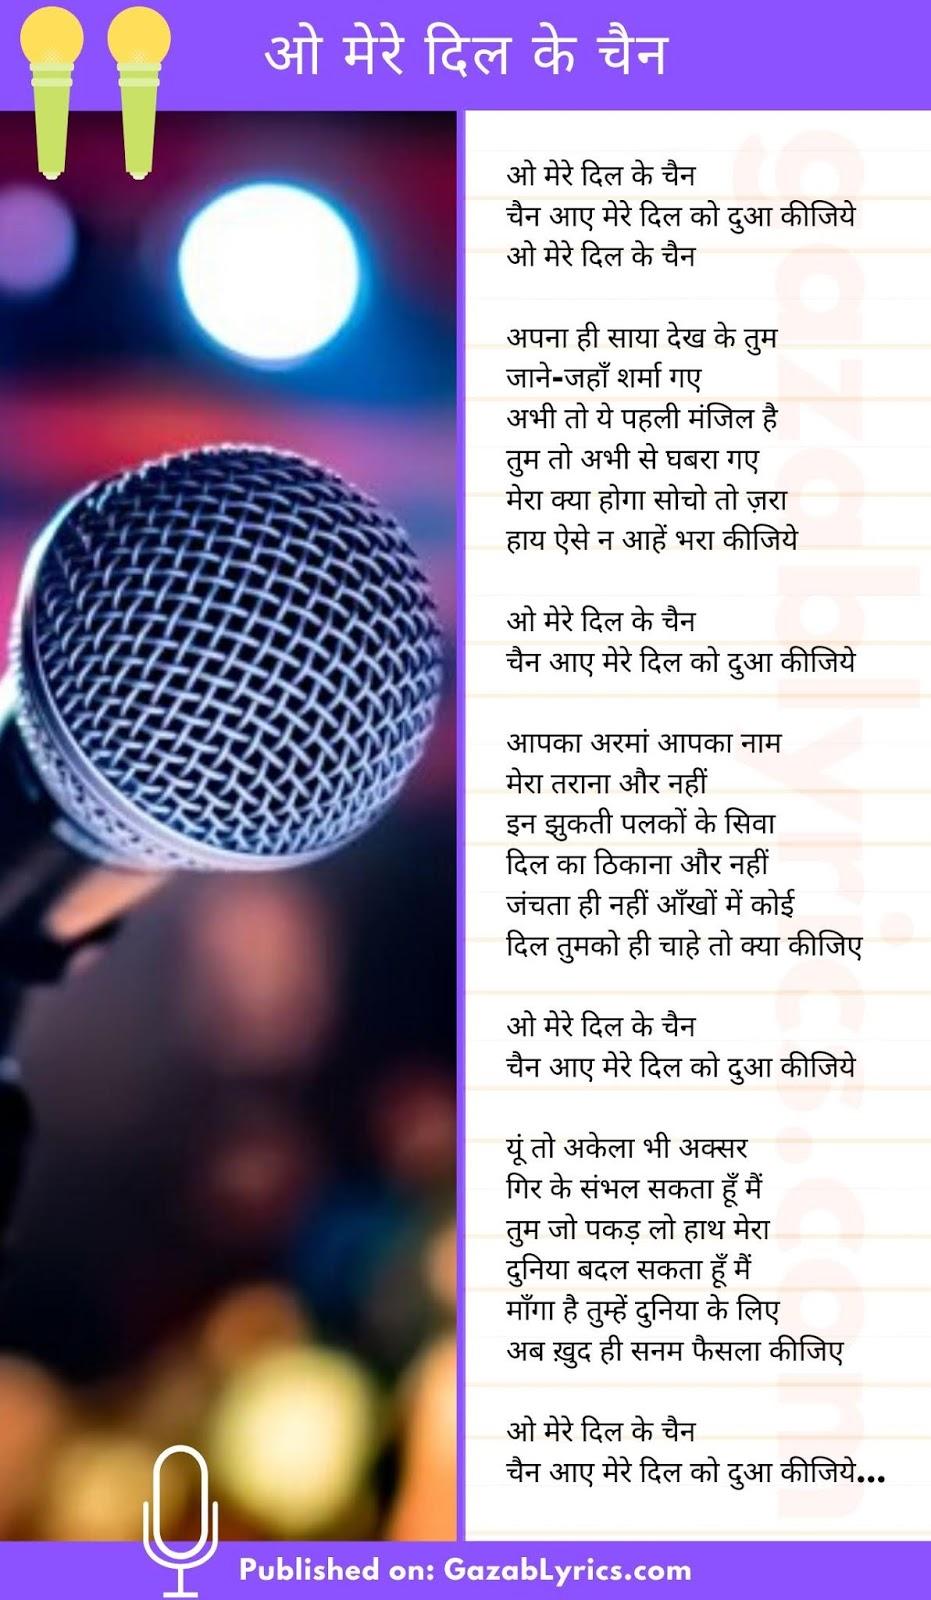 Oh Mere Dil Ke Chain song lyrics image